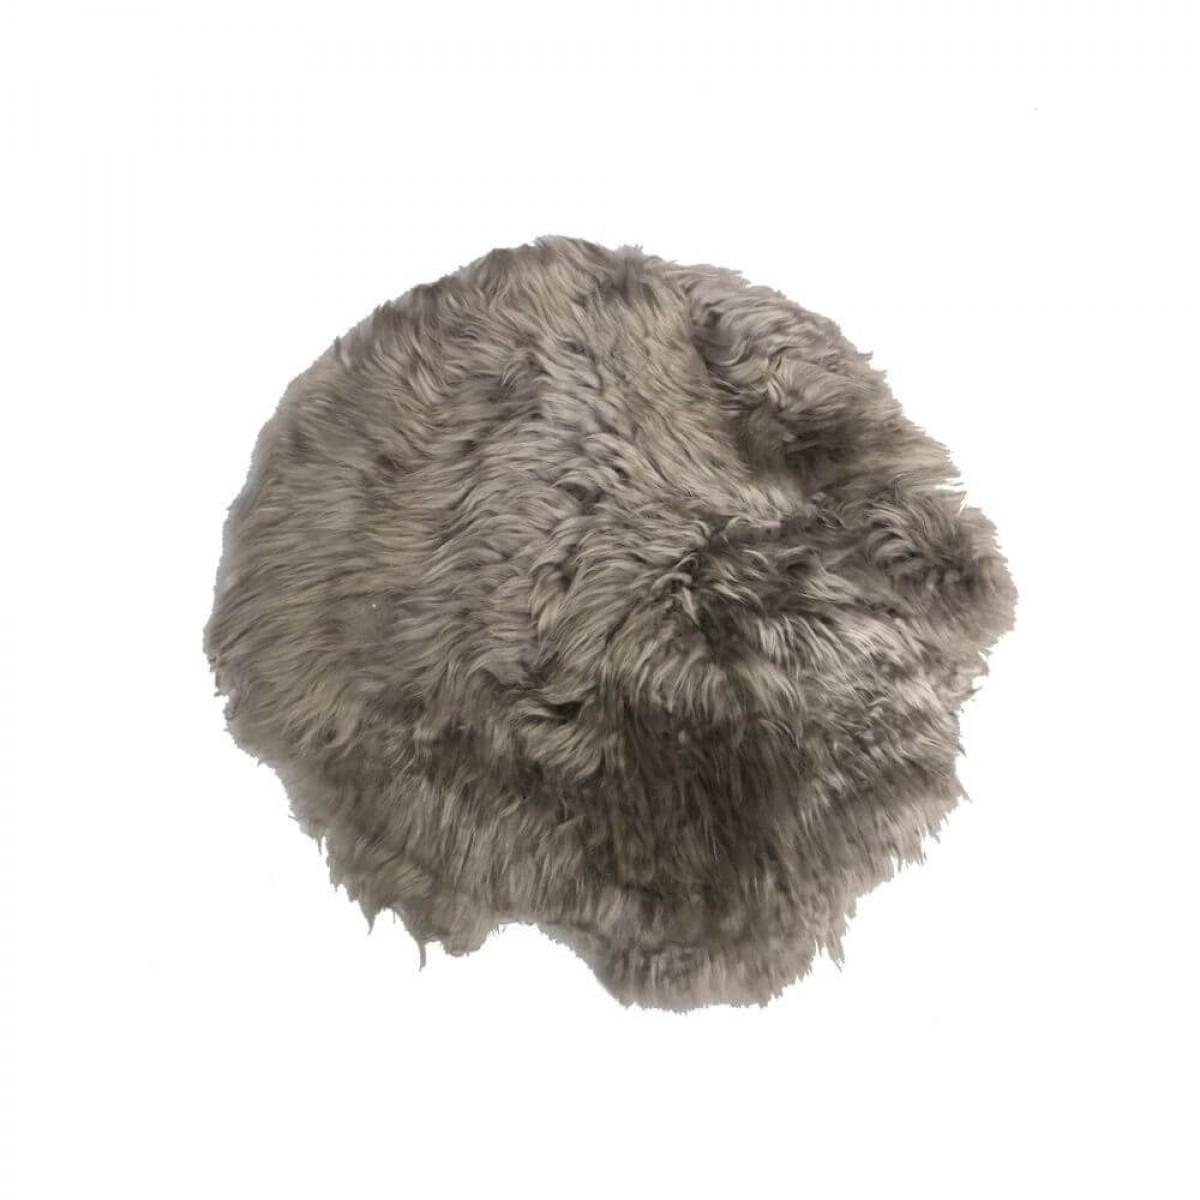 DACORE Sædehynde lammeskind stone rund ø 37 cm